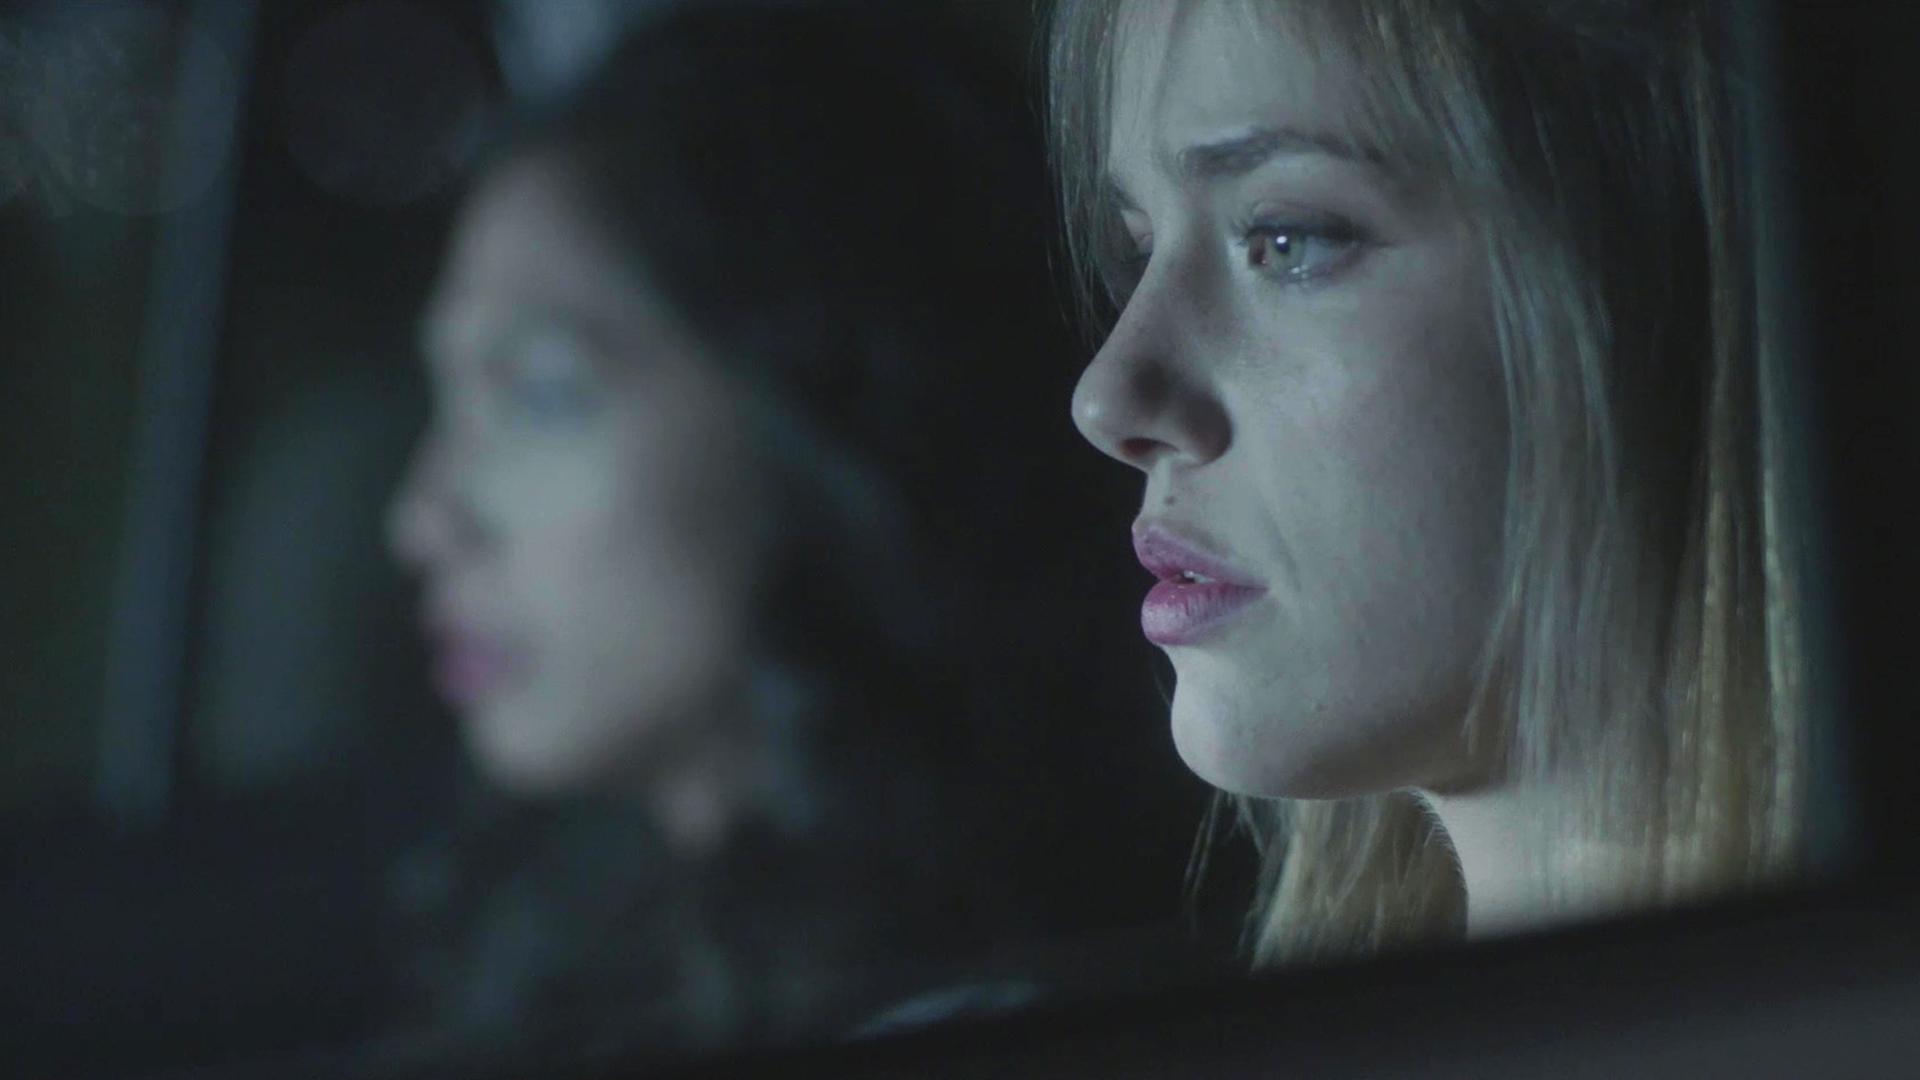 Temporada 1 T1 - C4: Ángela